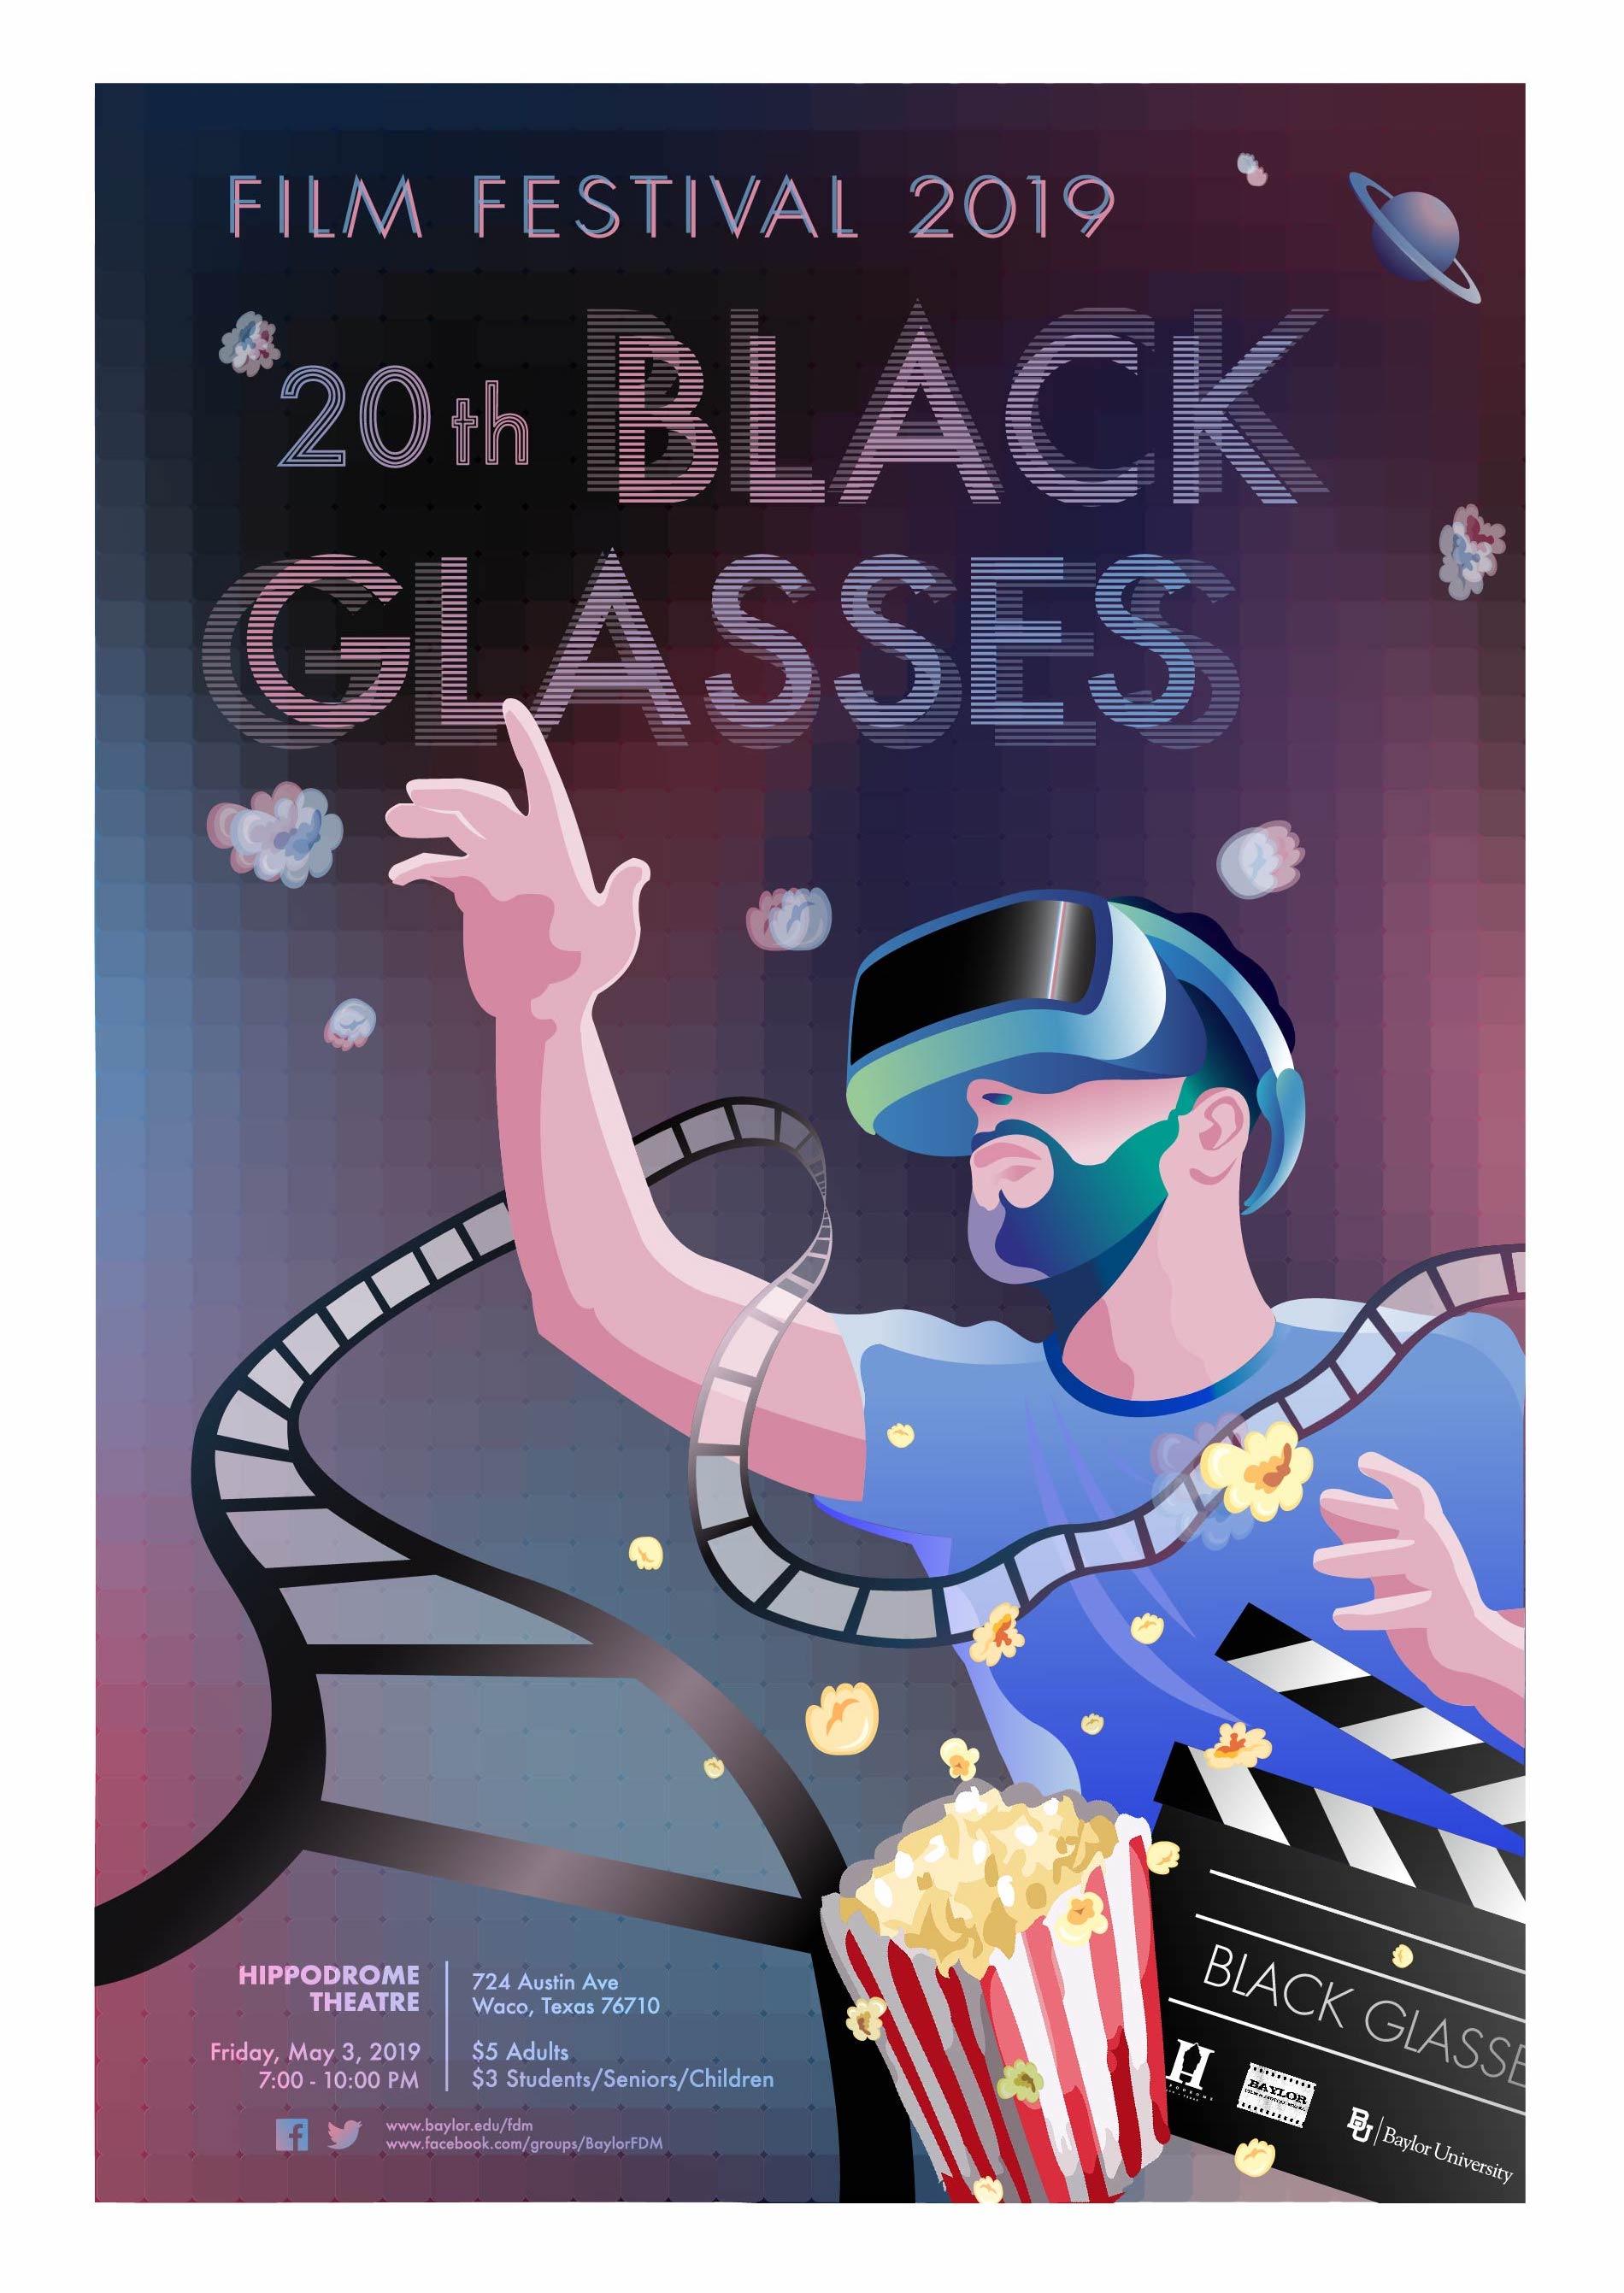 Black Glasses Poster, Zitian Zhou